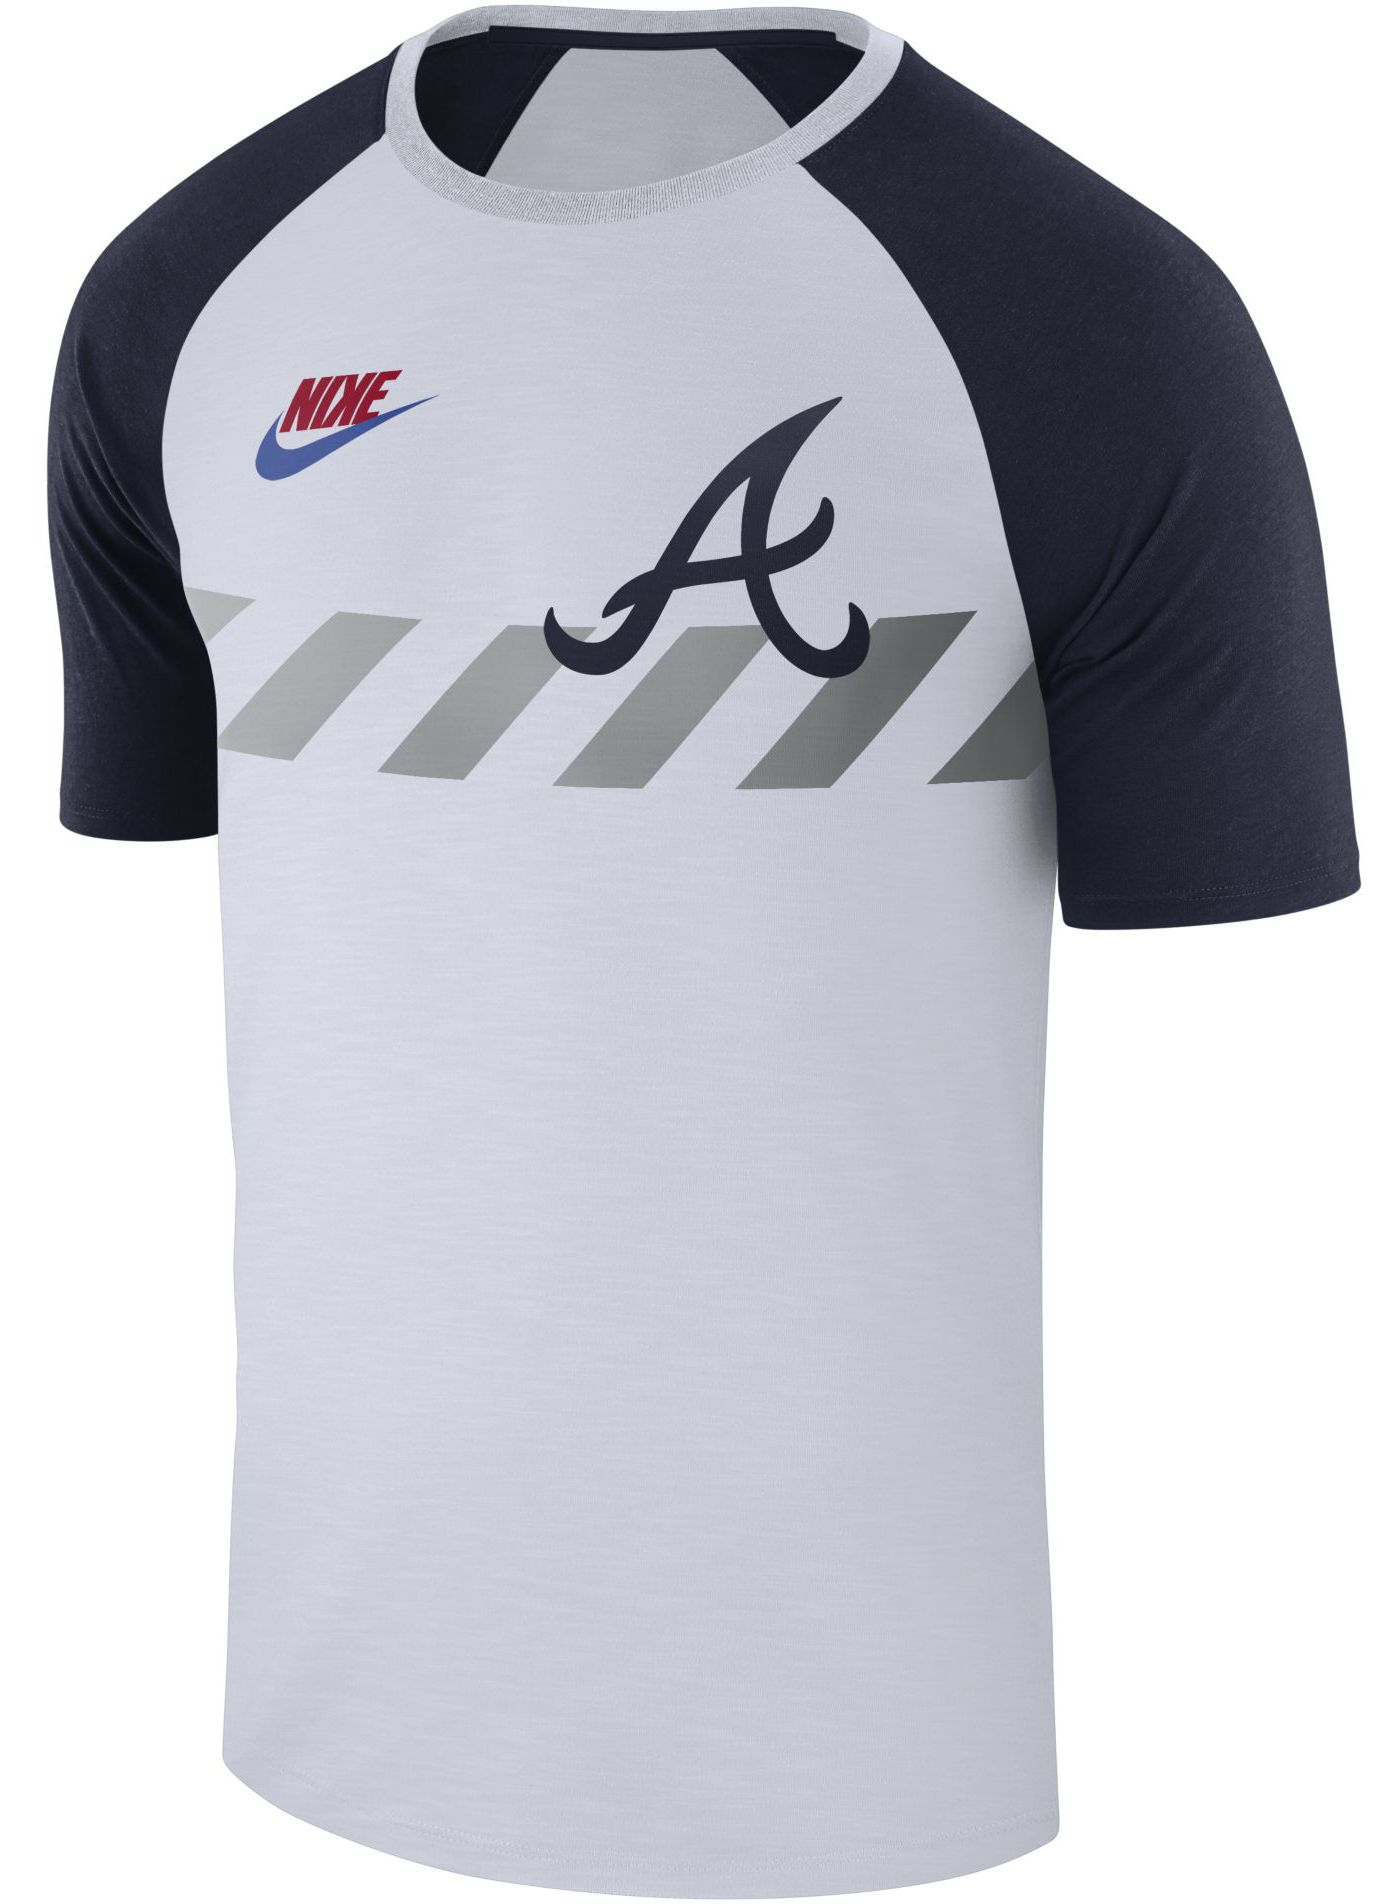 Nike Men's Atlanta Braves Dri-FIT Raglan T-Shirt